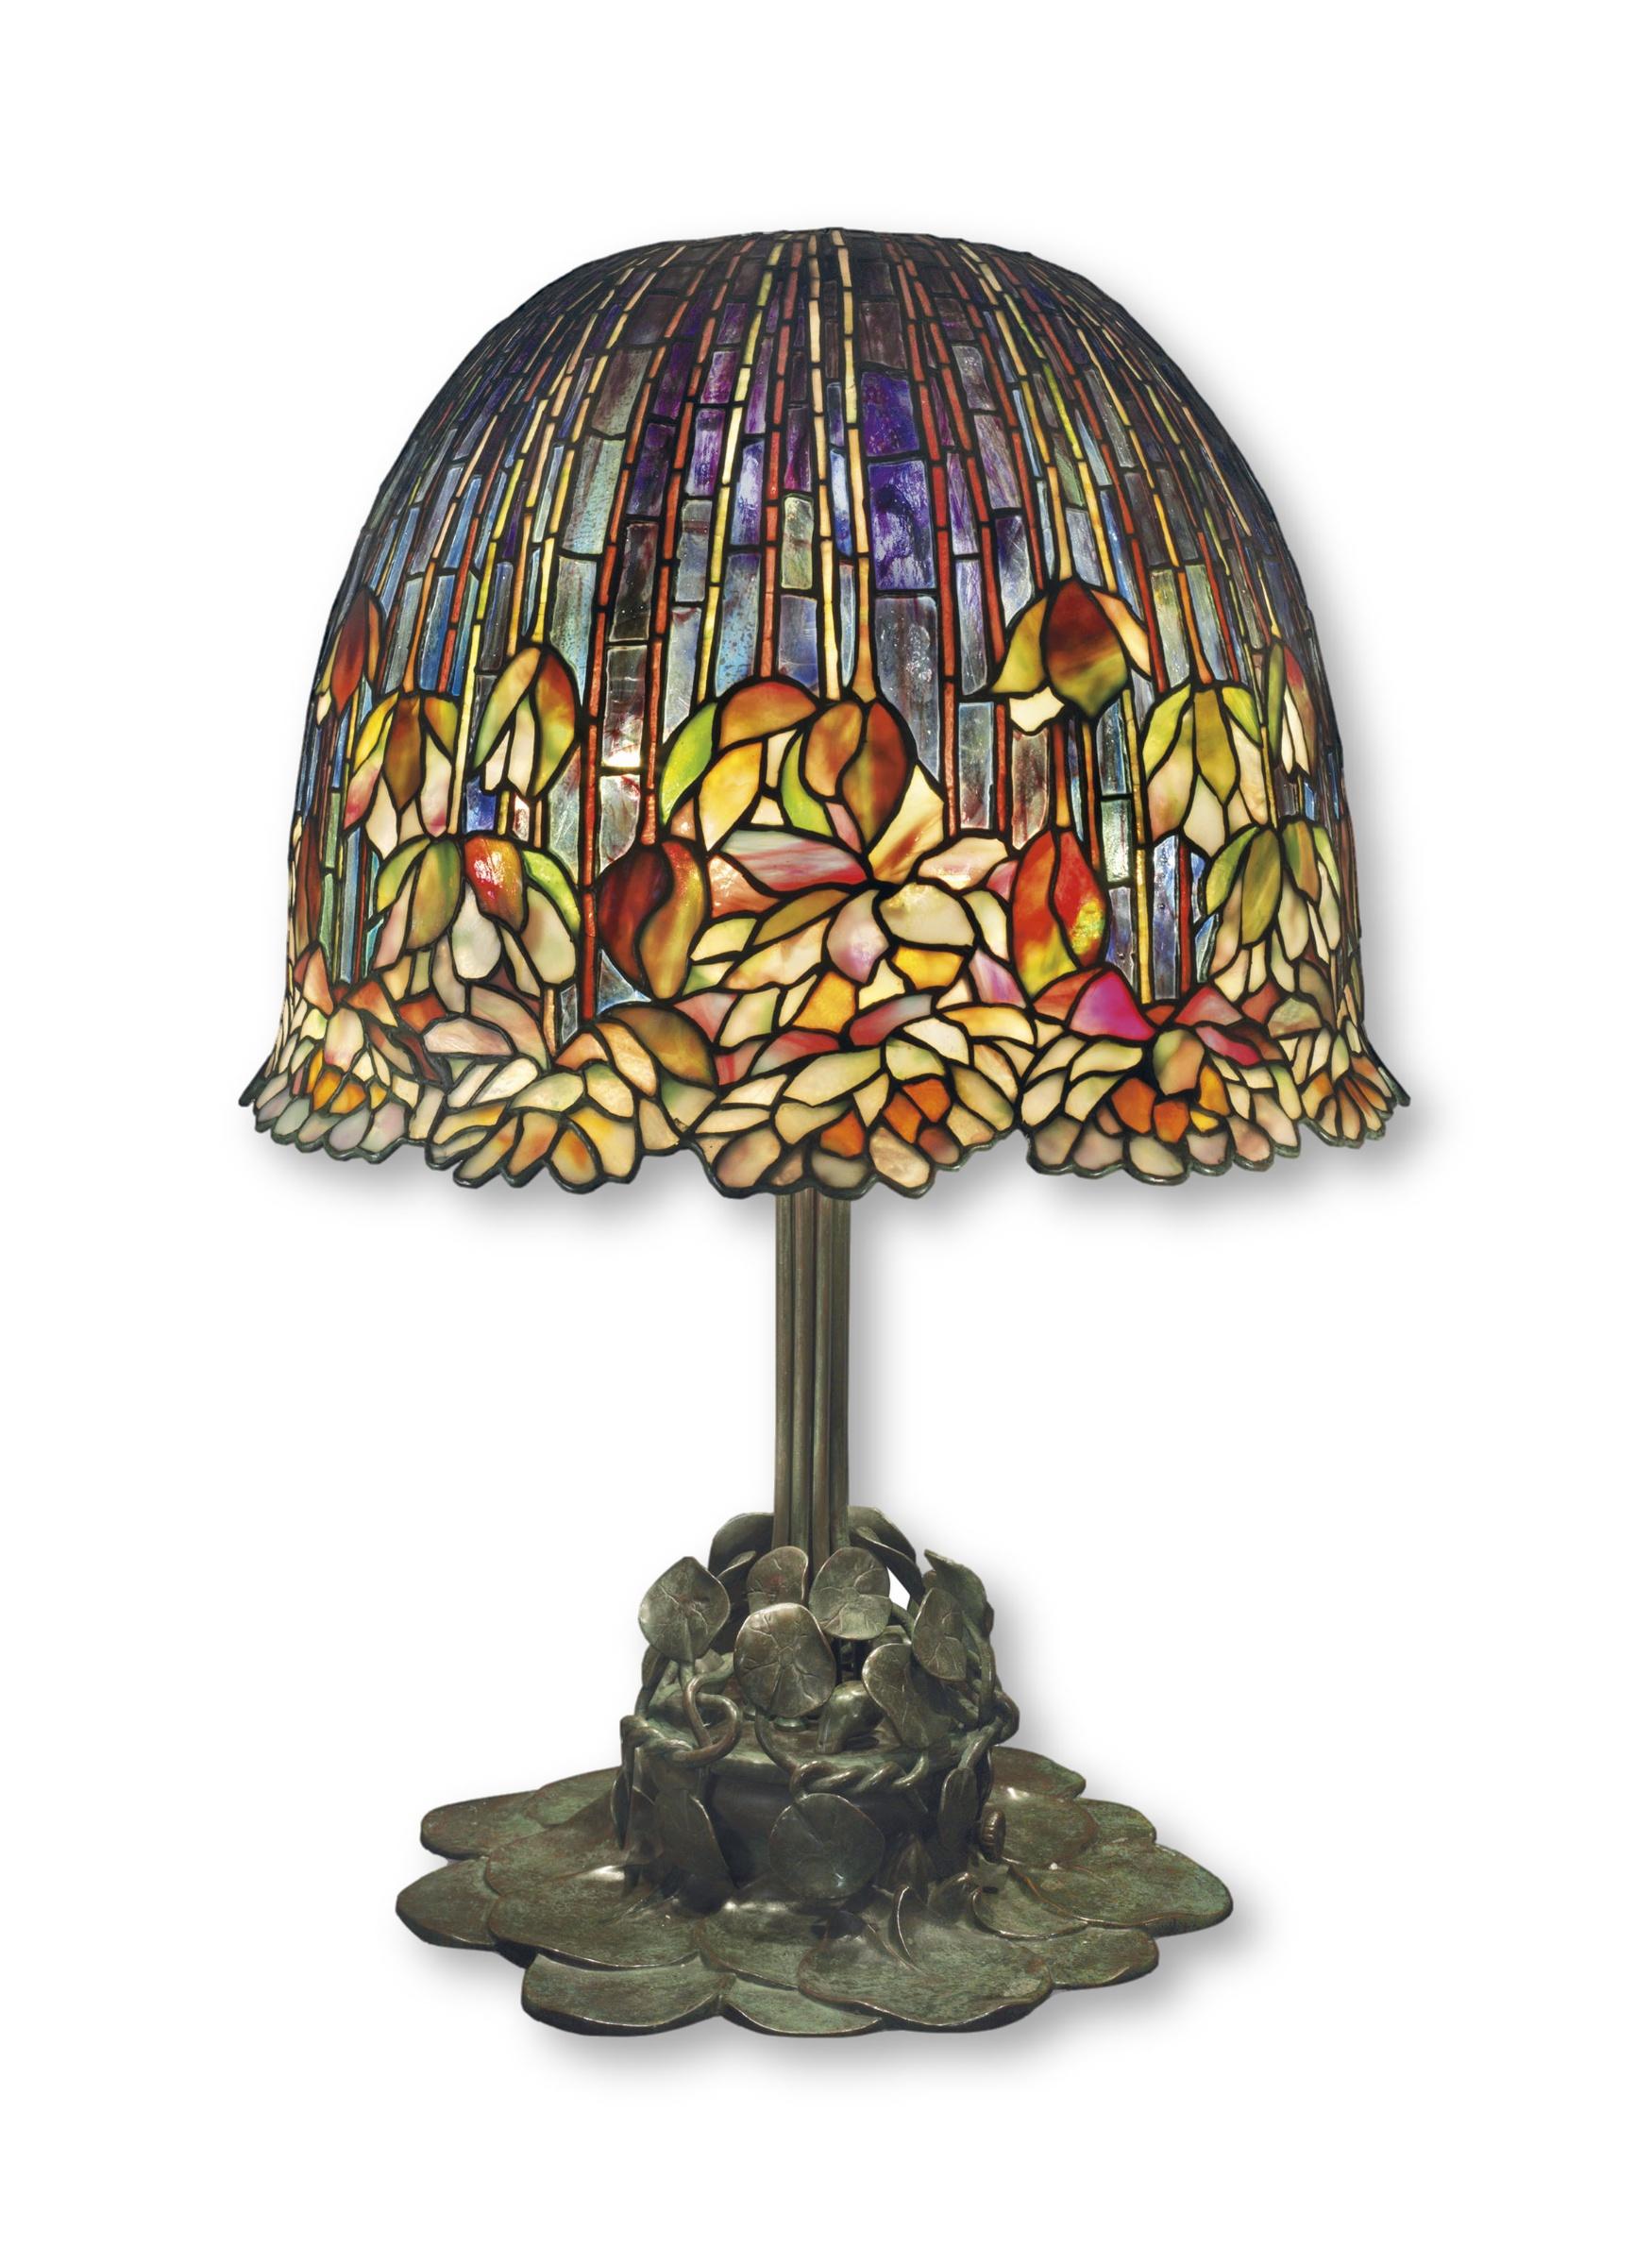 Lampe Tiffany Lily Pond